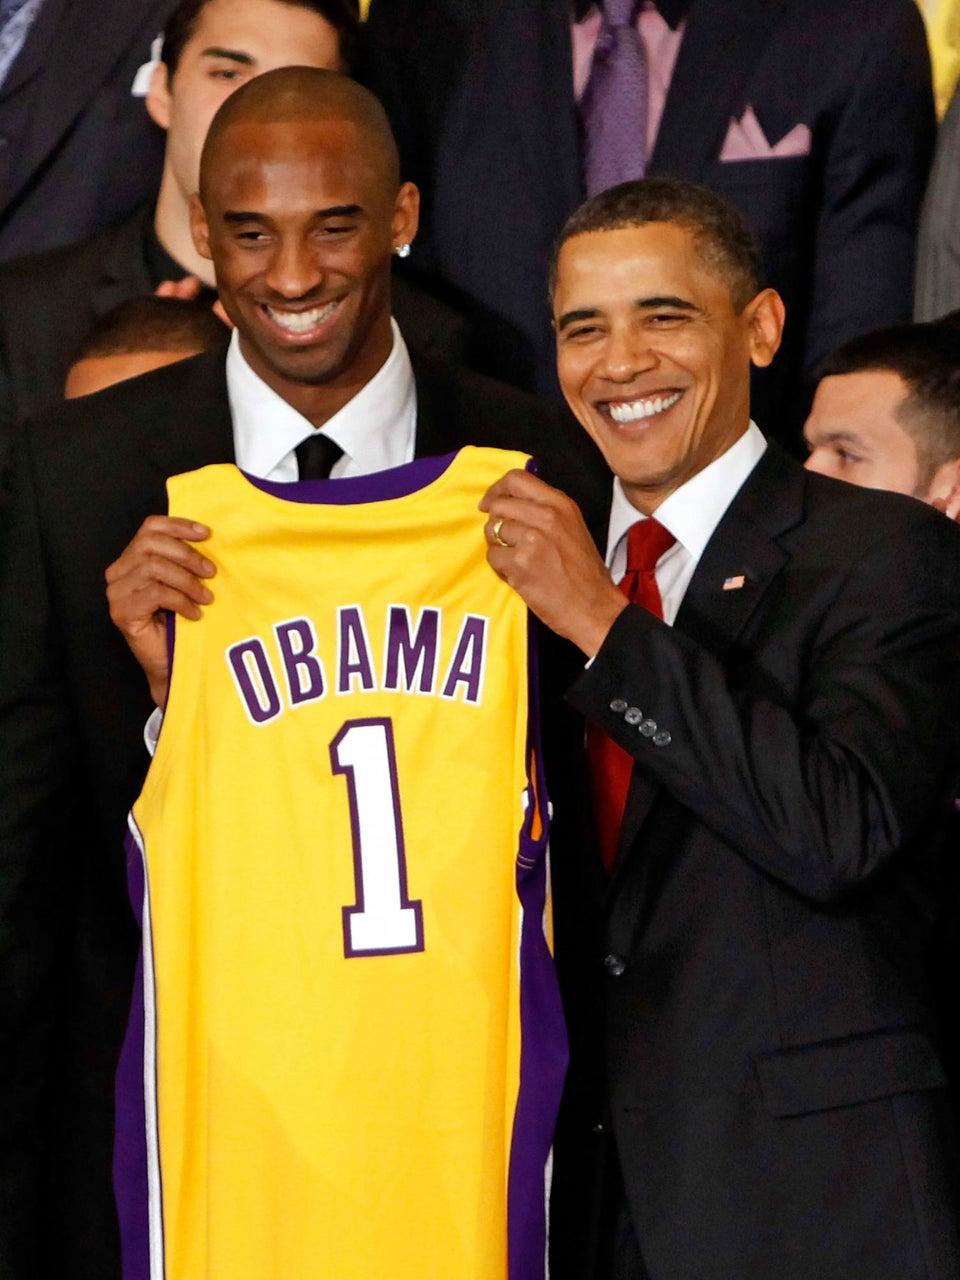 Kobe Bryant Dishes on Talking Trash on the Court with President Obama